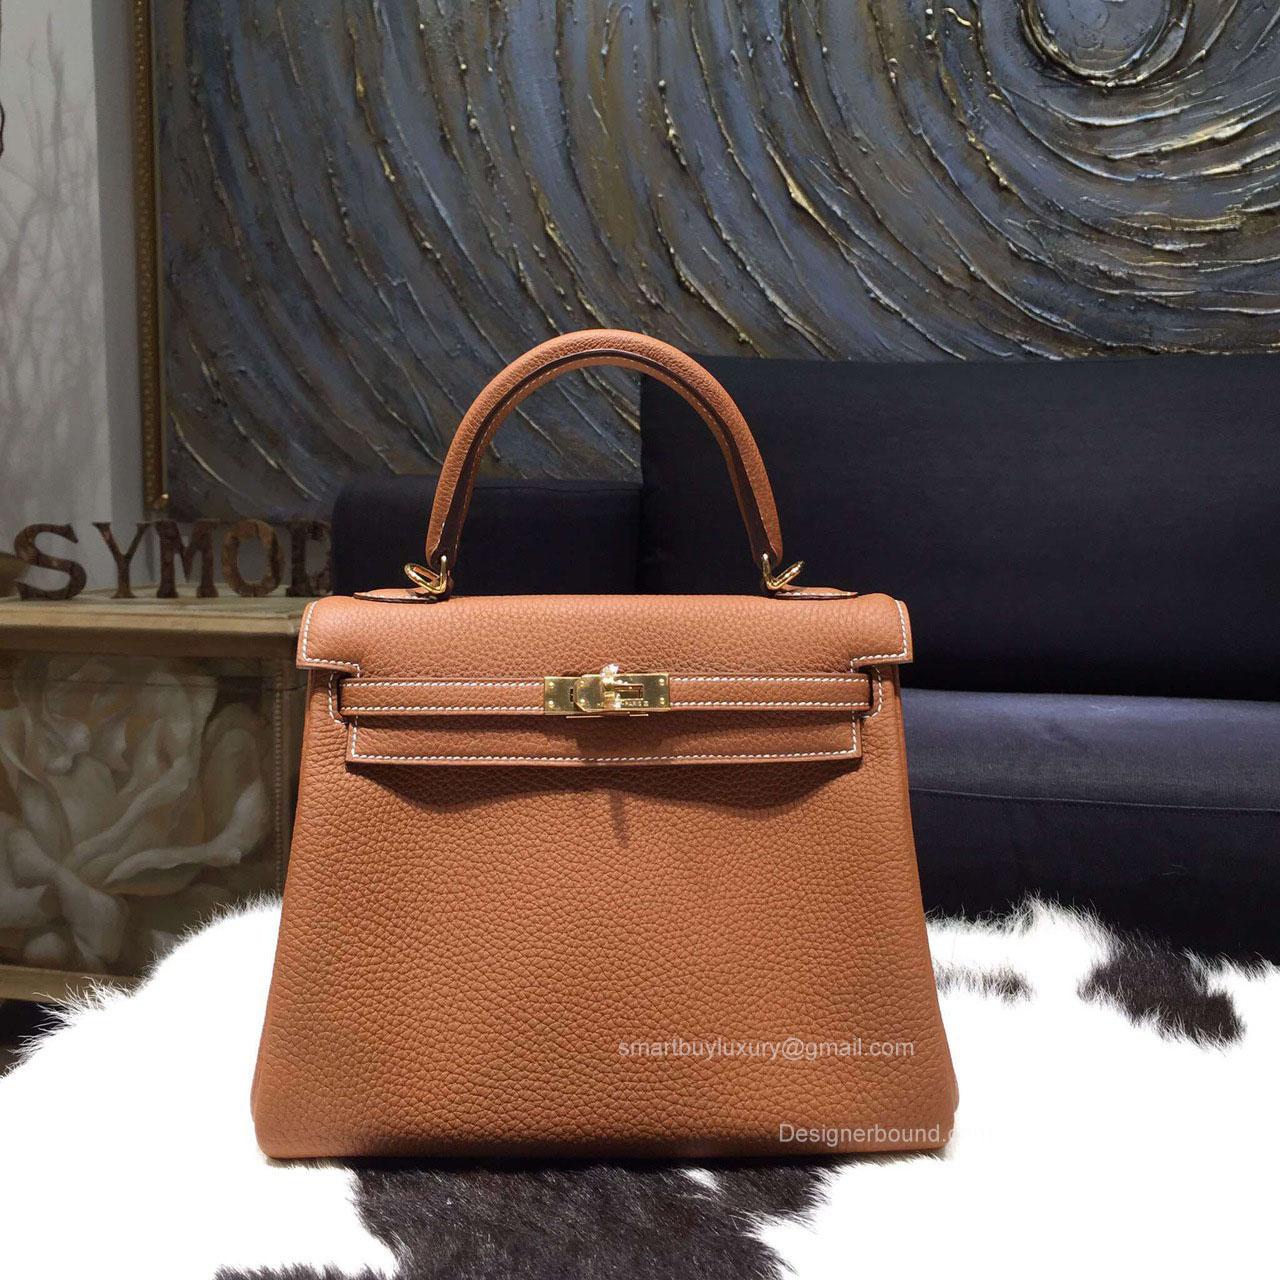 Hermes Kelly 25 Hermes Bag Price Range